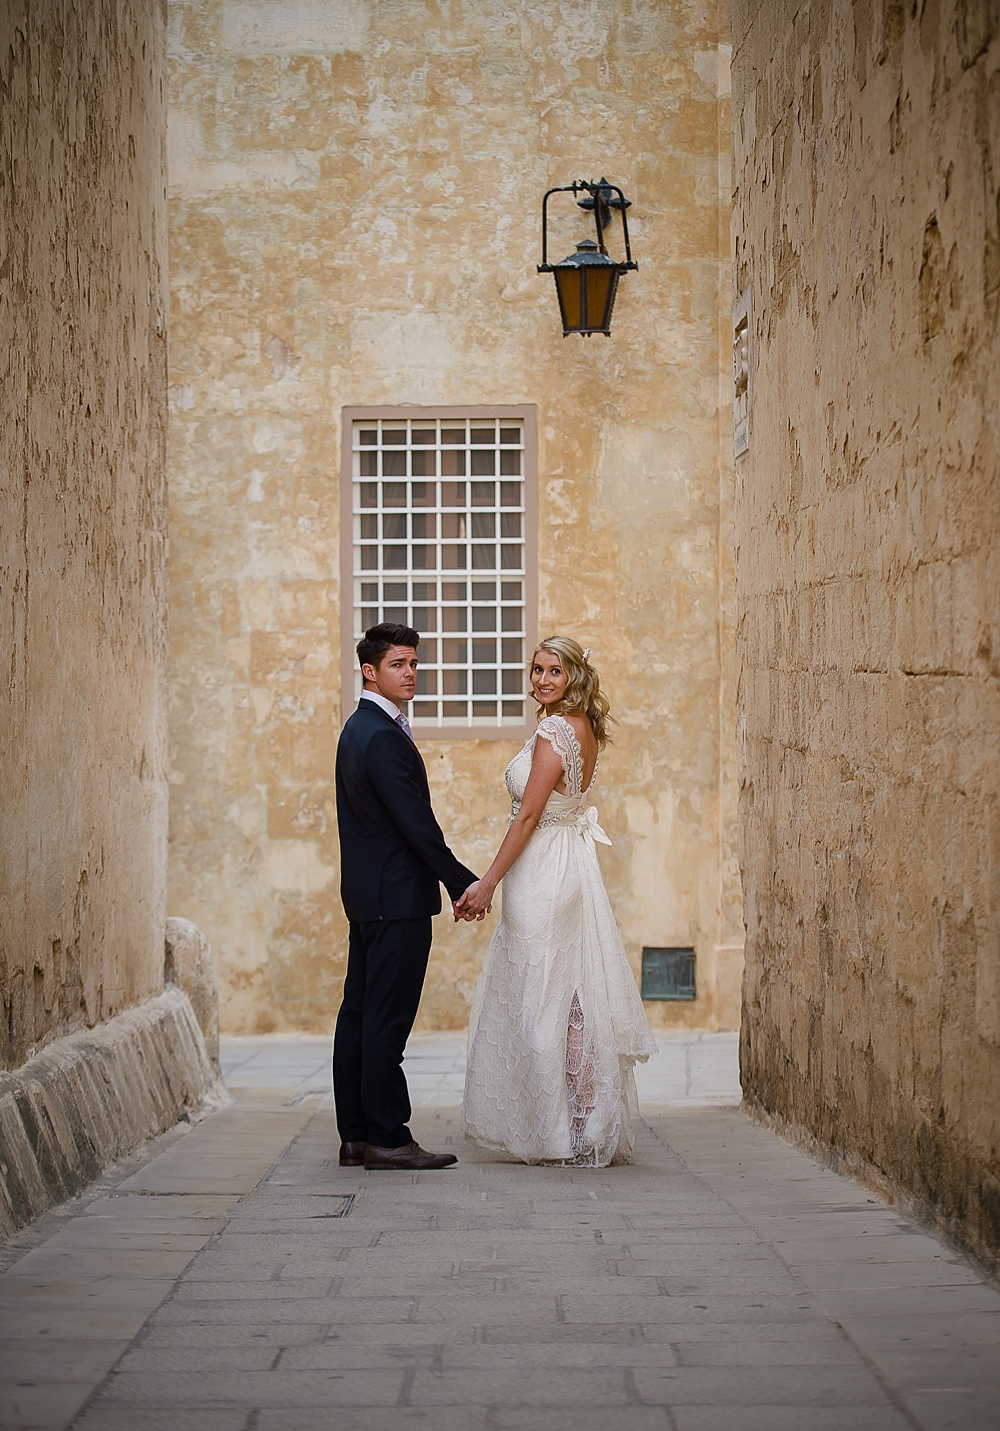 Wedding Photography Malta - Palazzo Parisio - Shane P. Watts Photography